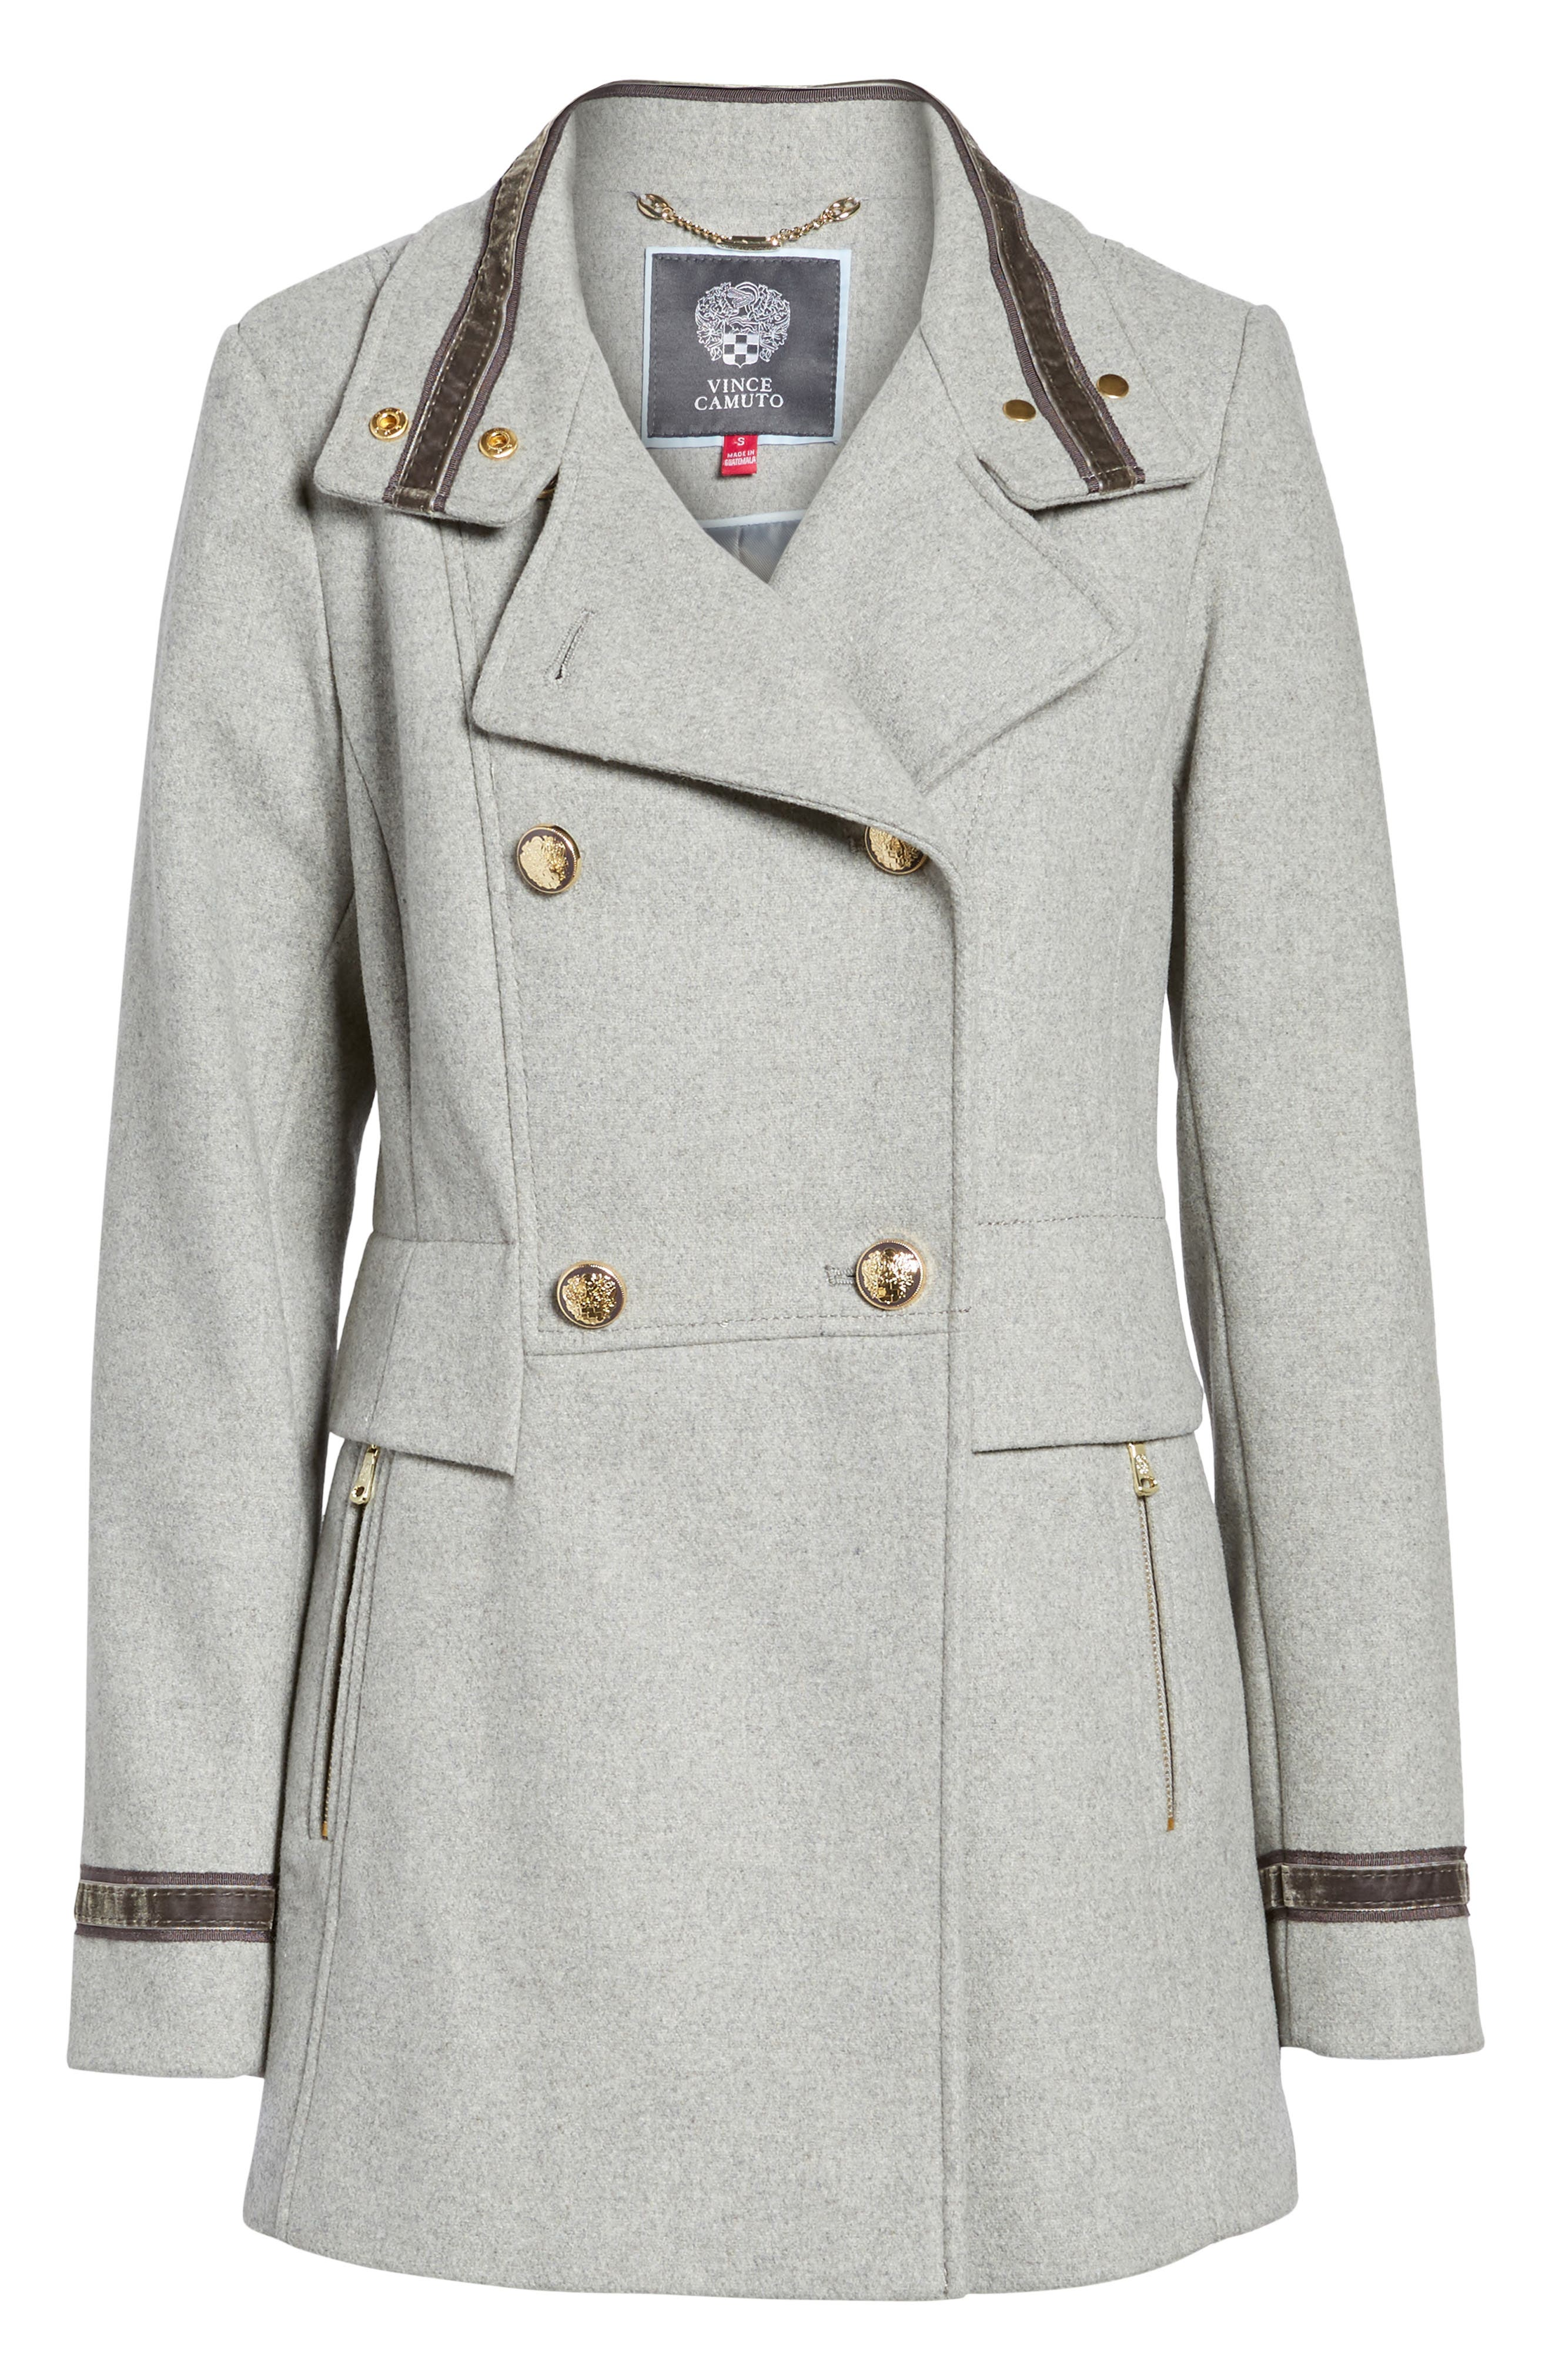 Wool Blend Military Coat,                             Main thumbnail 1, color,                             Light Grey